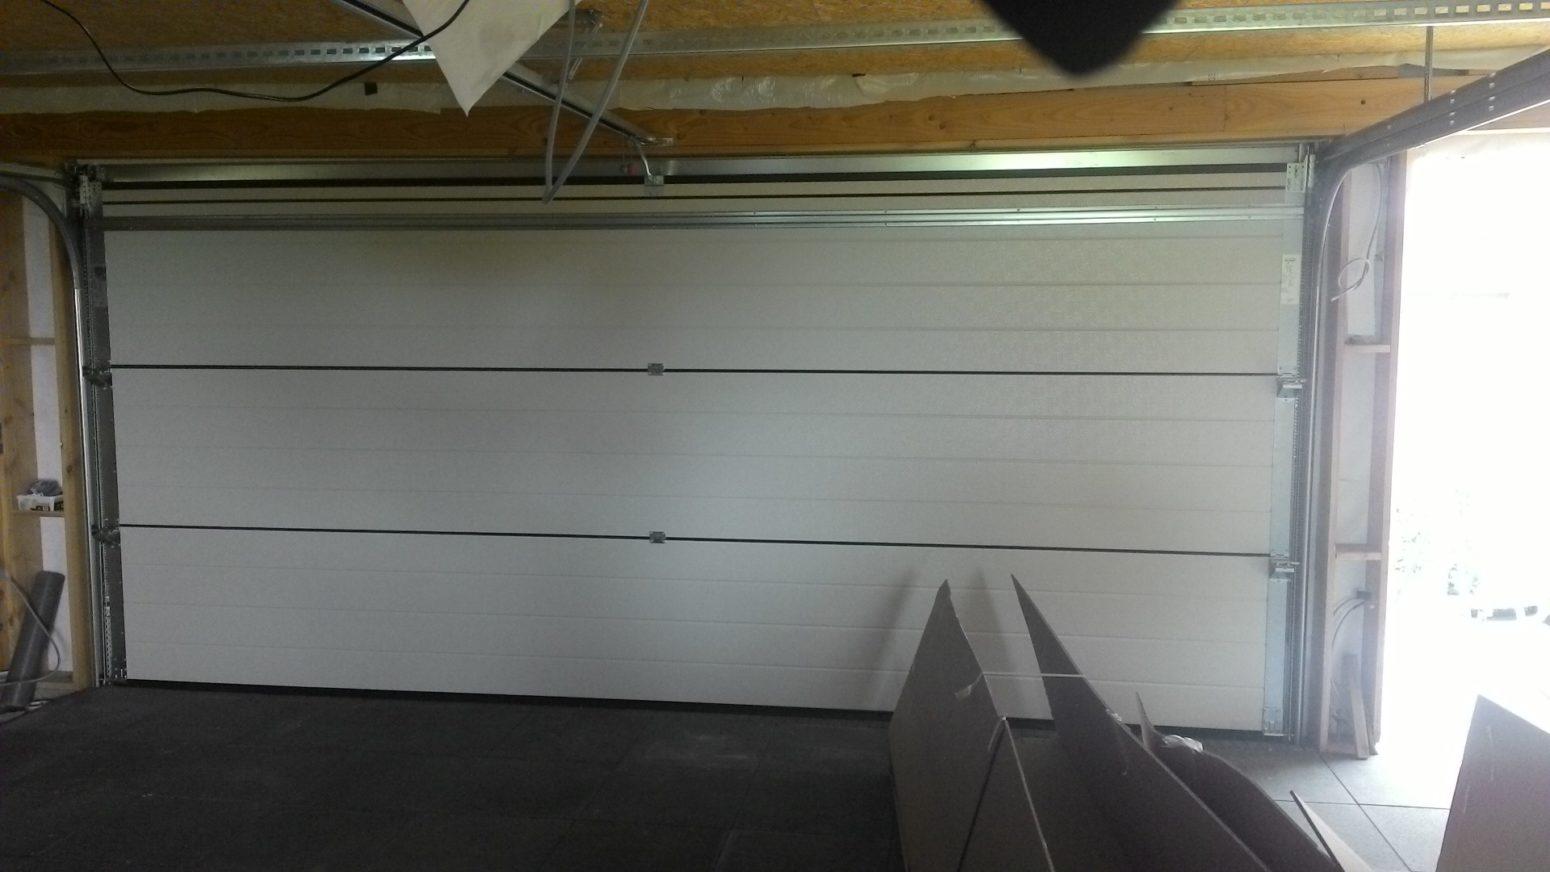 Binnenkant garagepoort